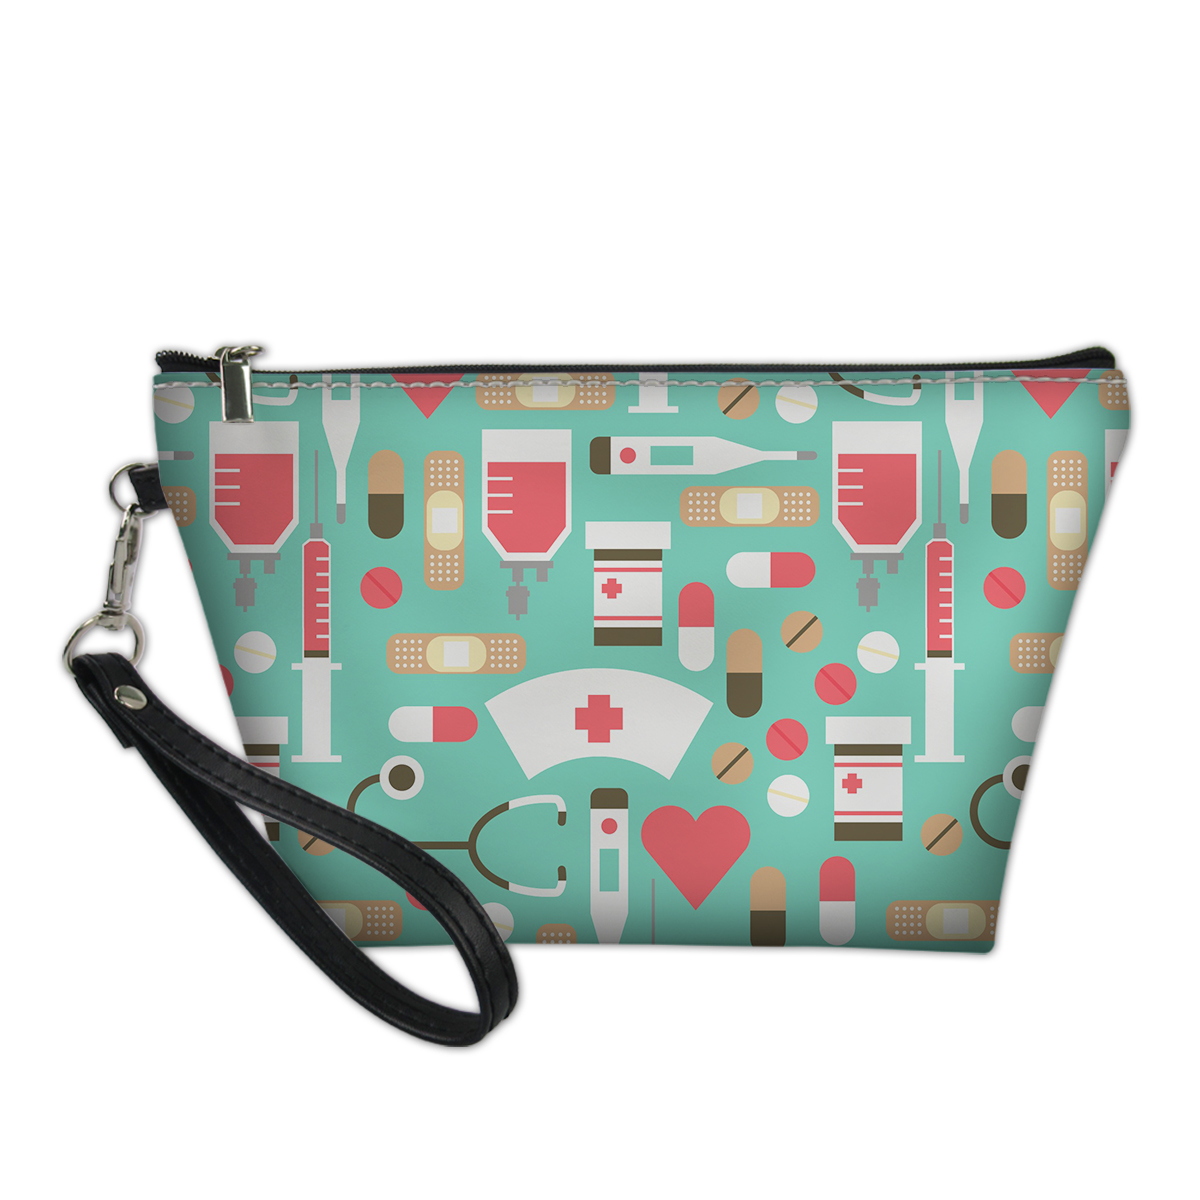 Thikin Cartoon Nursing Items Print Makeup Bag For Girls Ladies Cosmetic Case Nurse Cute Pattern Pencil Box Daily HandBags Custom